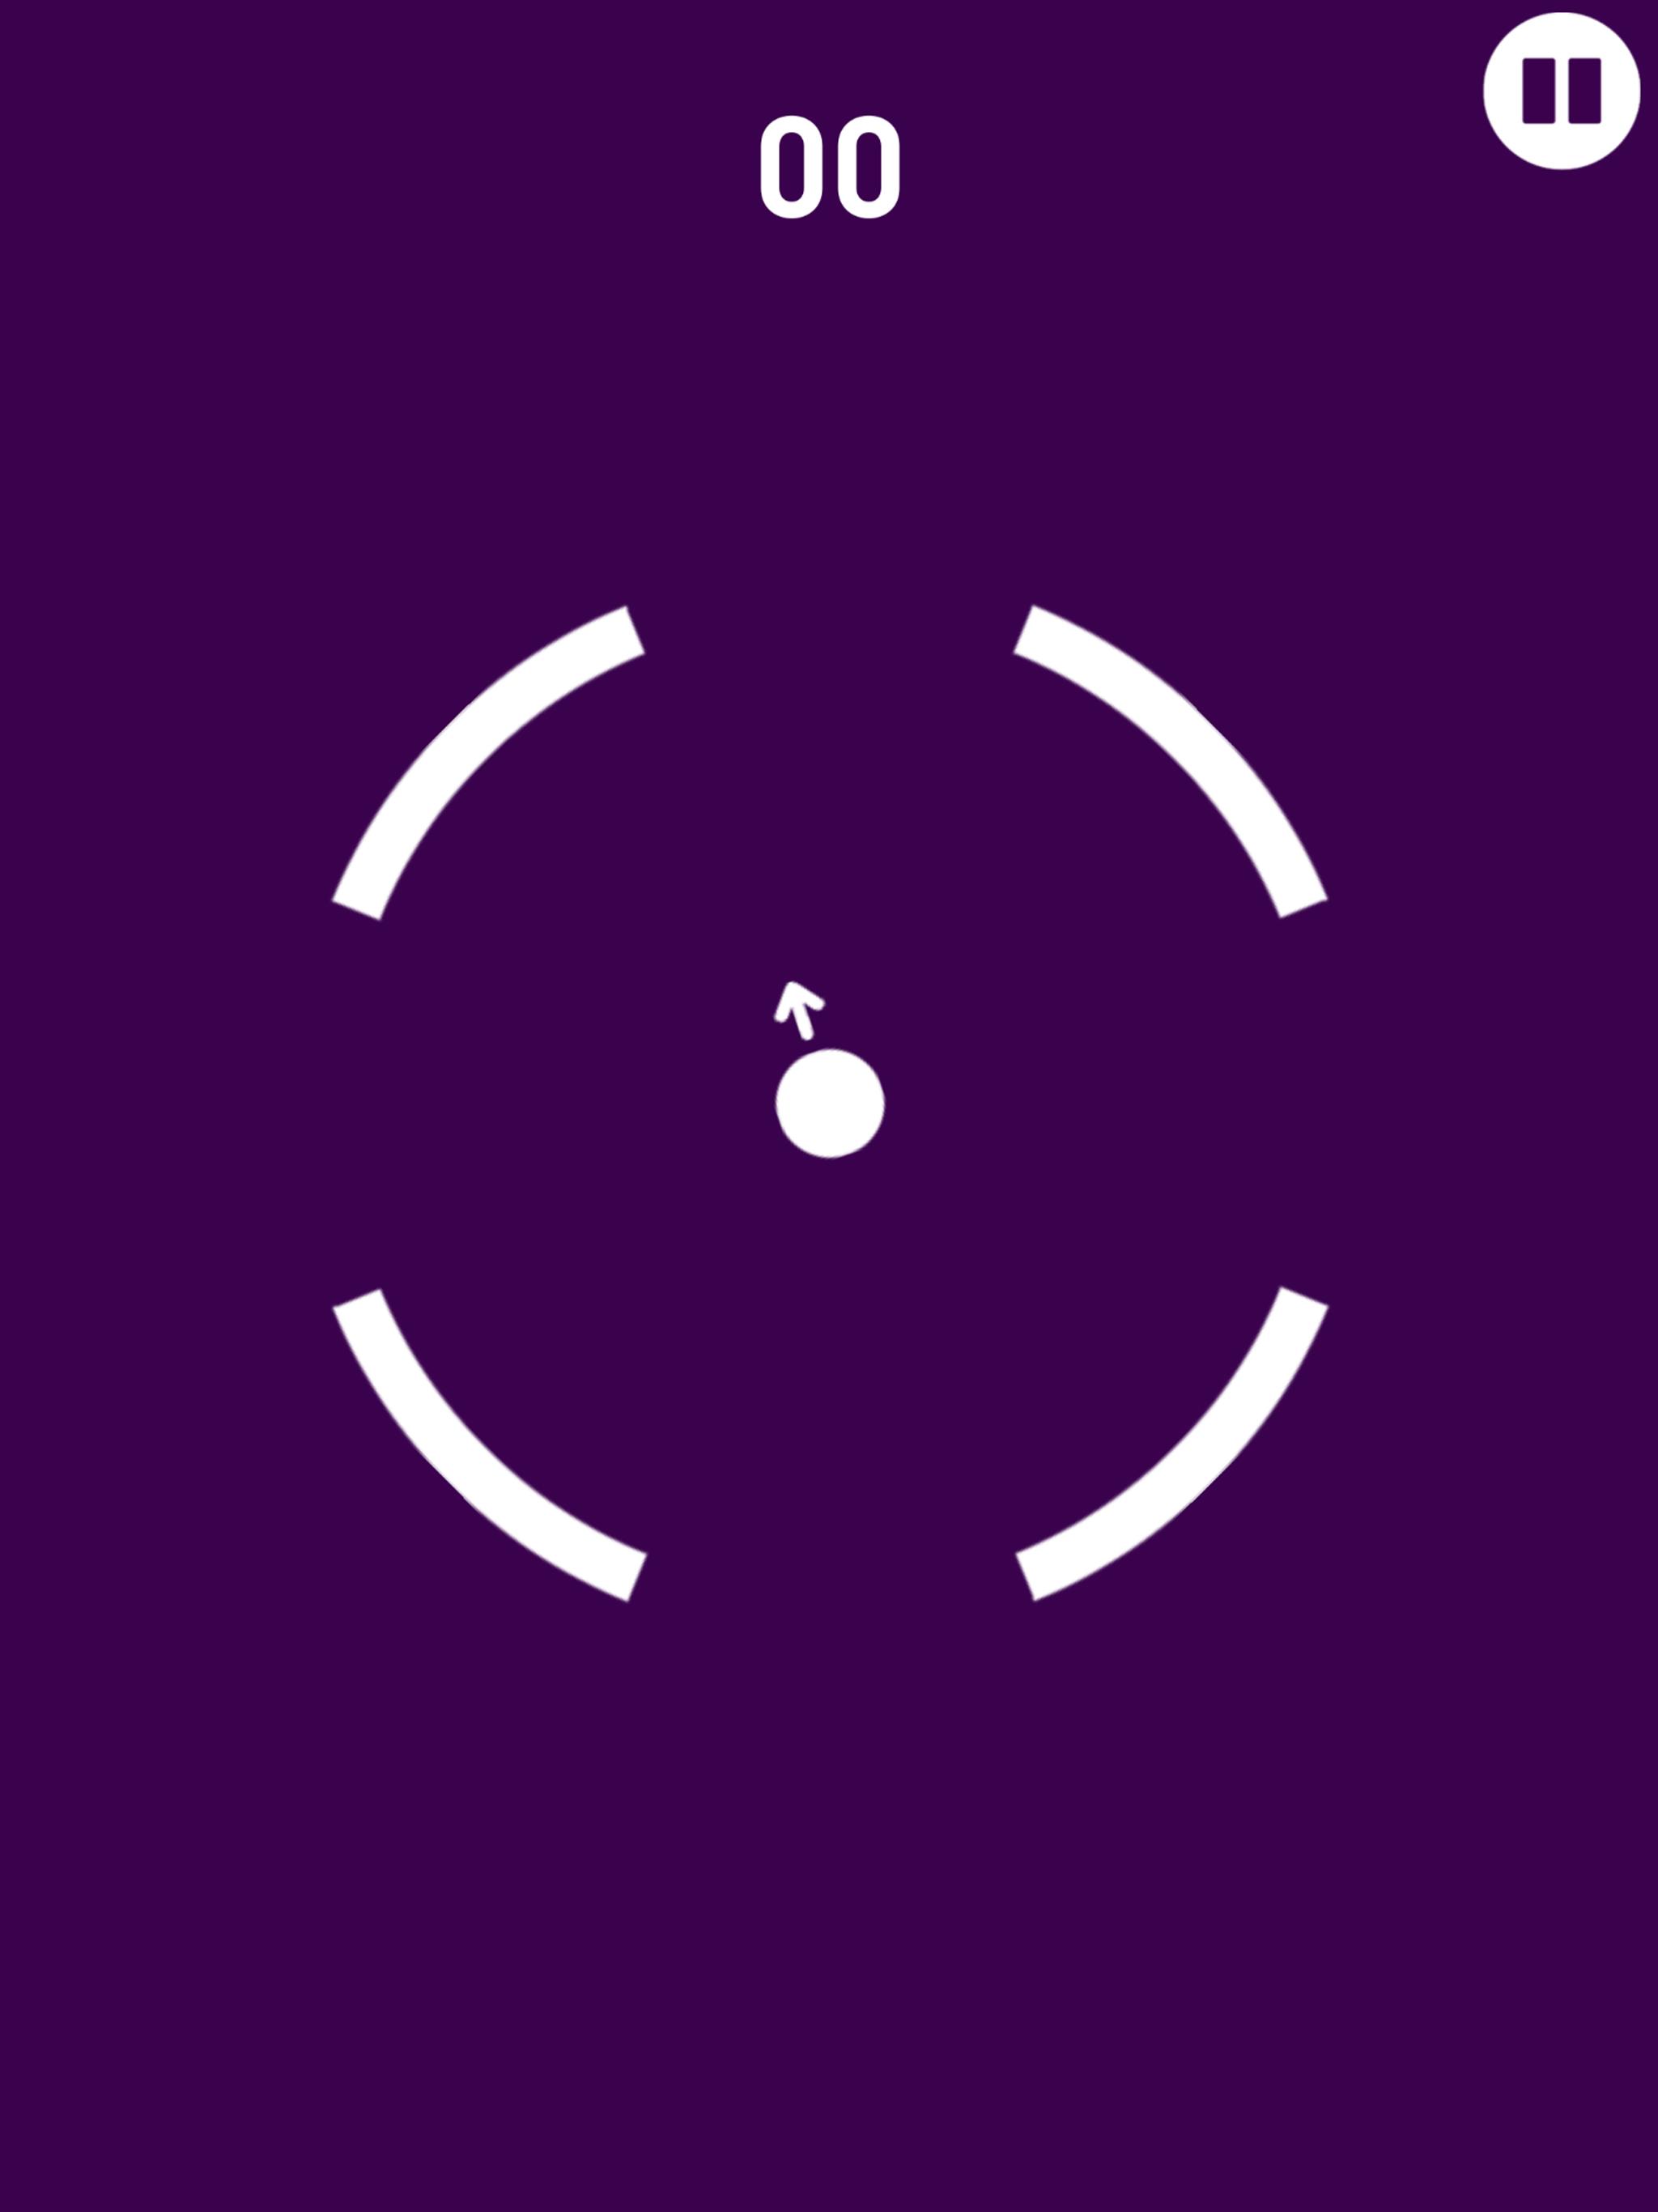 12.9-Inch Retina Display3.jpg